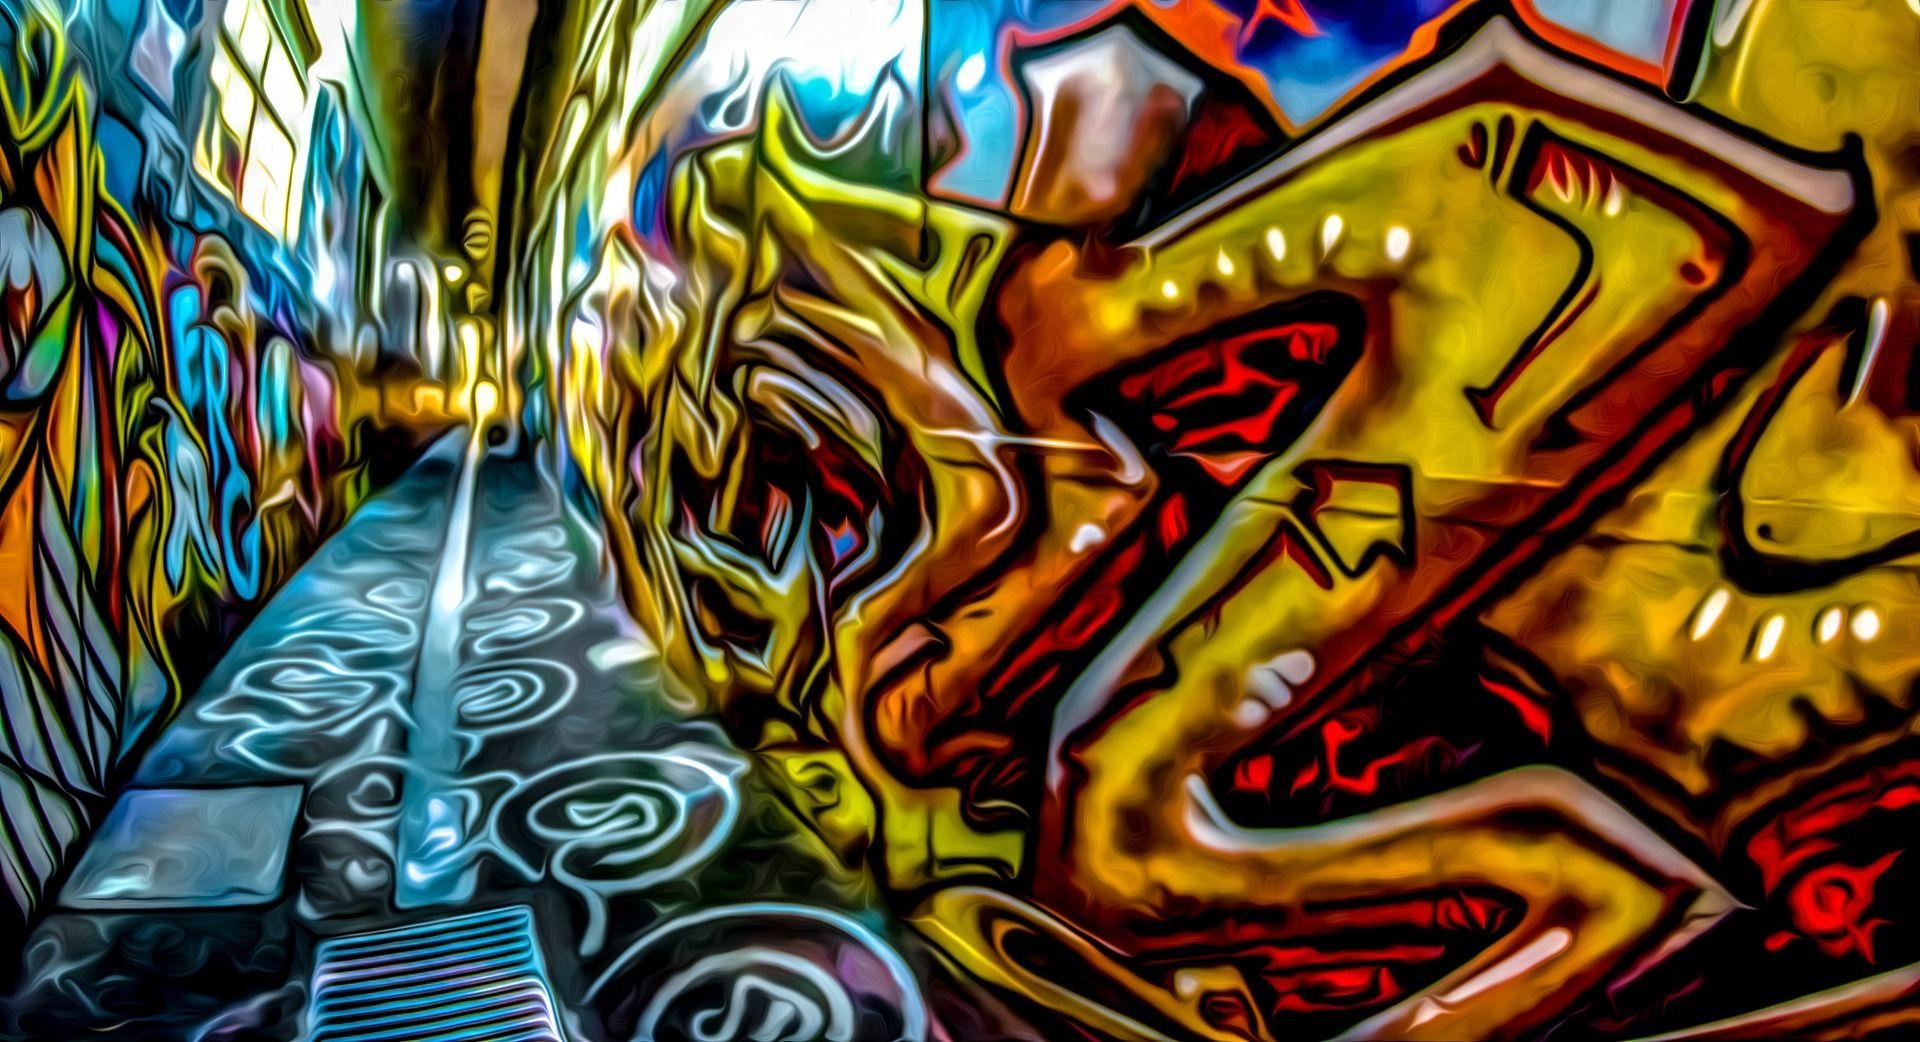 Graffiti art wallpaper - Graffiti Art Wallpaper